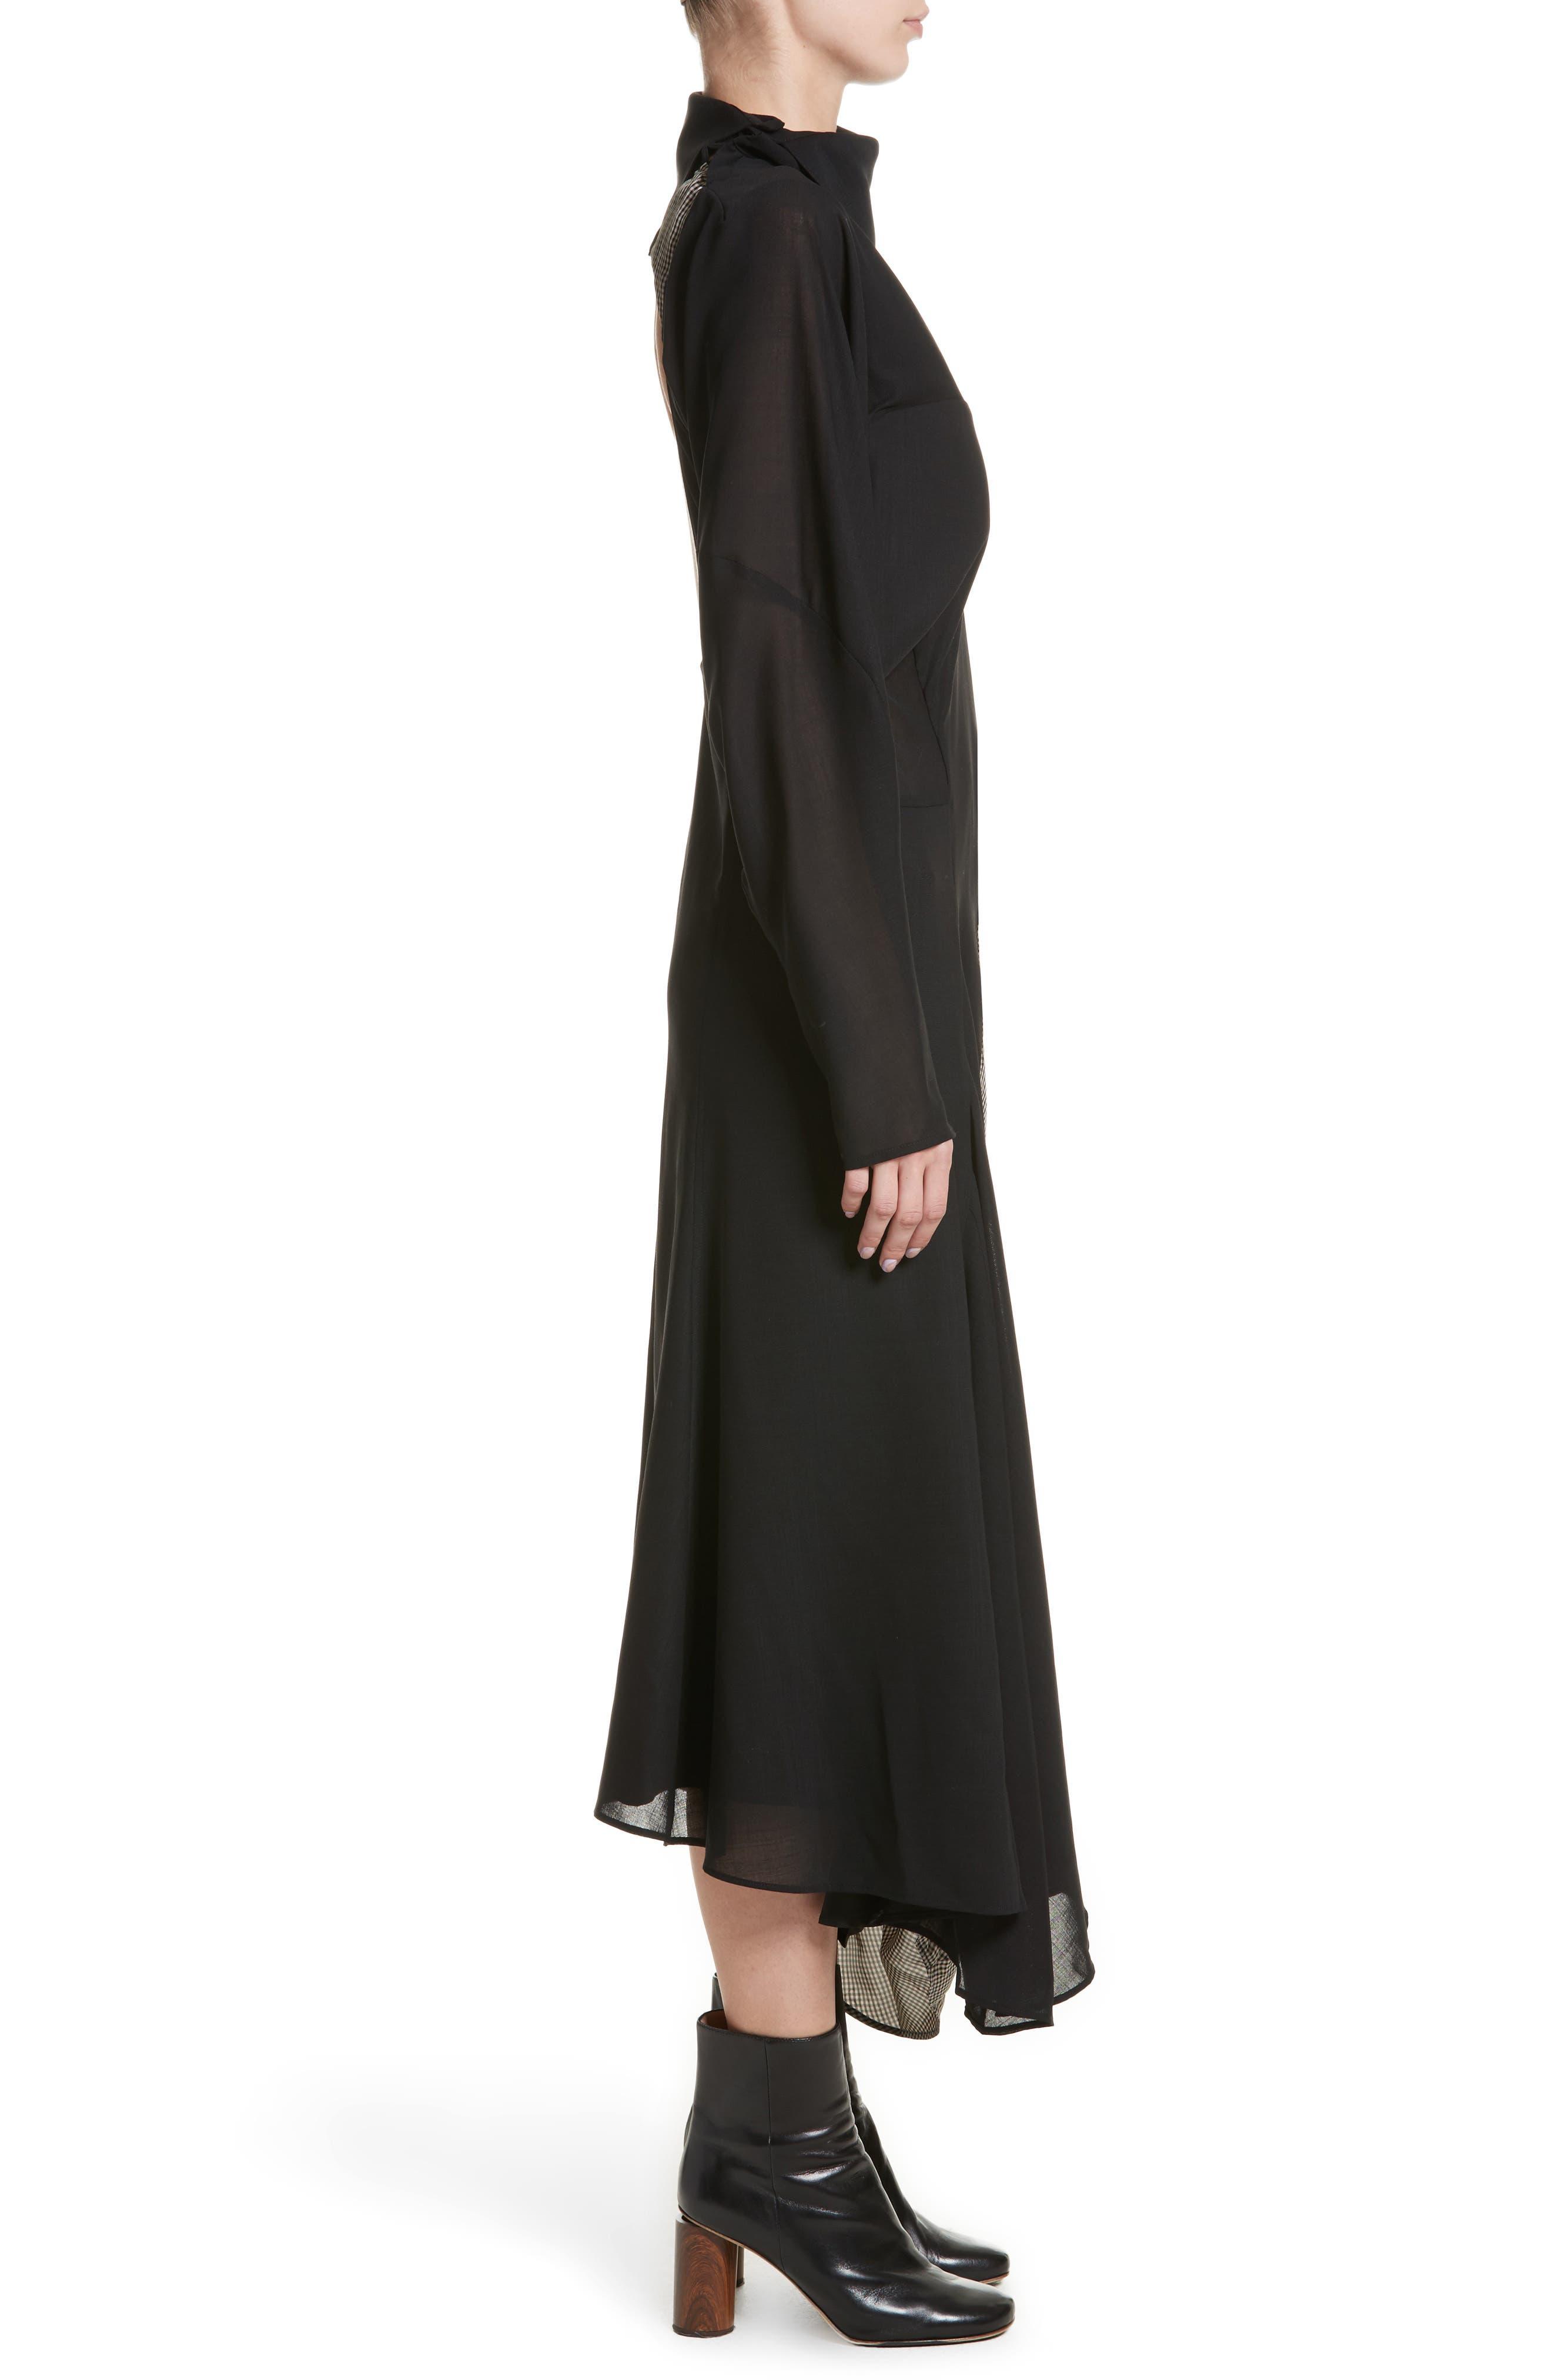 Dragica Mixed Media Dress,                             Alternate thumbnail 3, color,                             Black